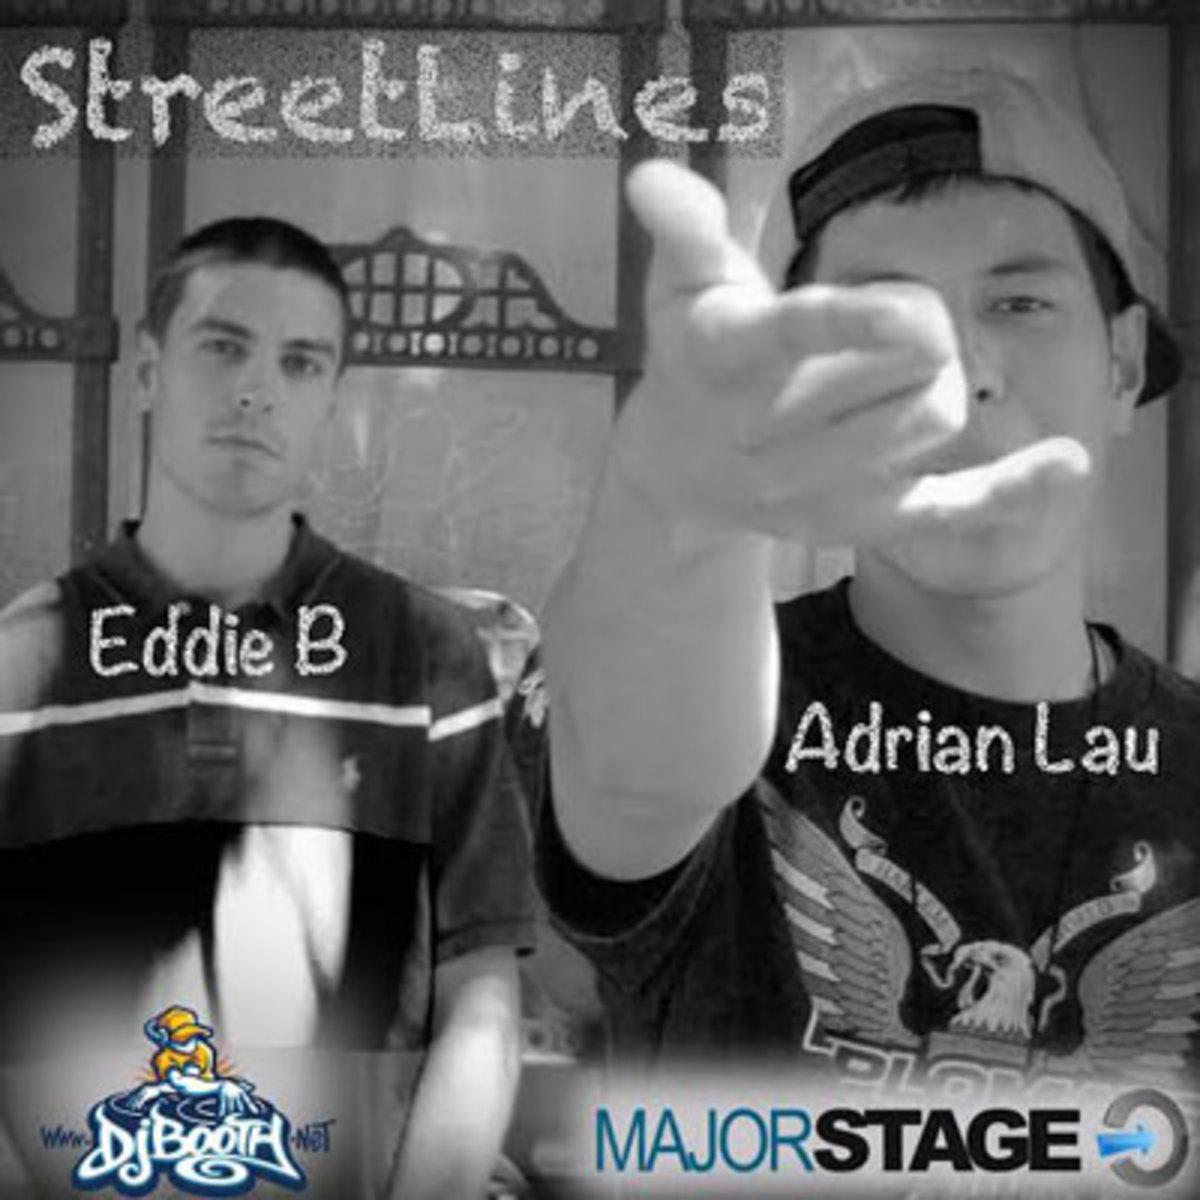 adrianlau-streetlines.jpg